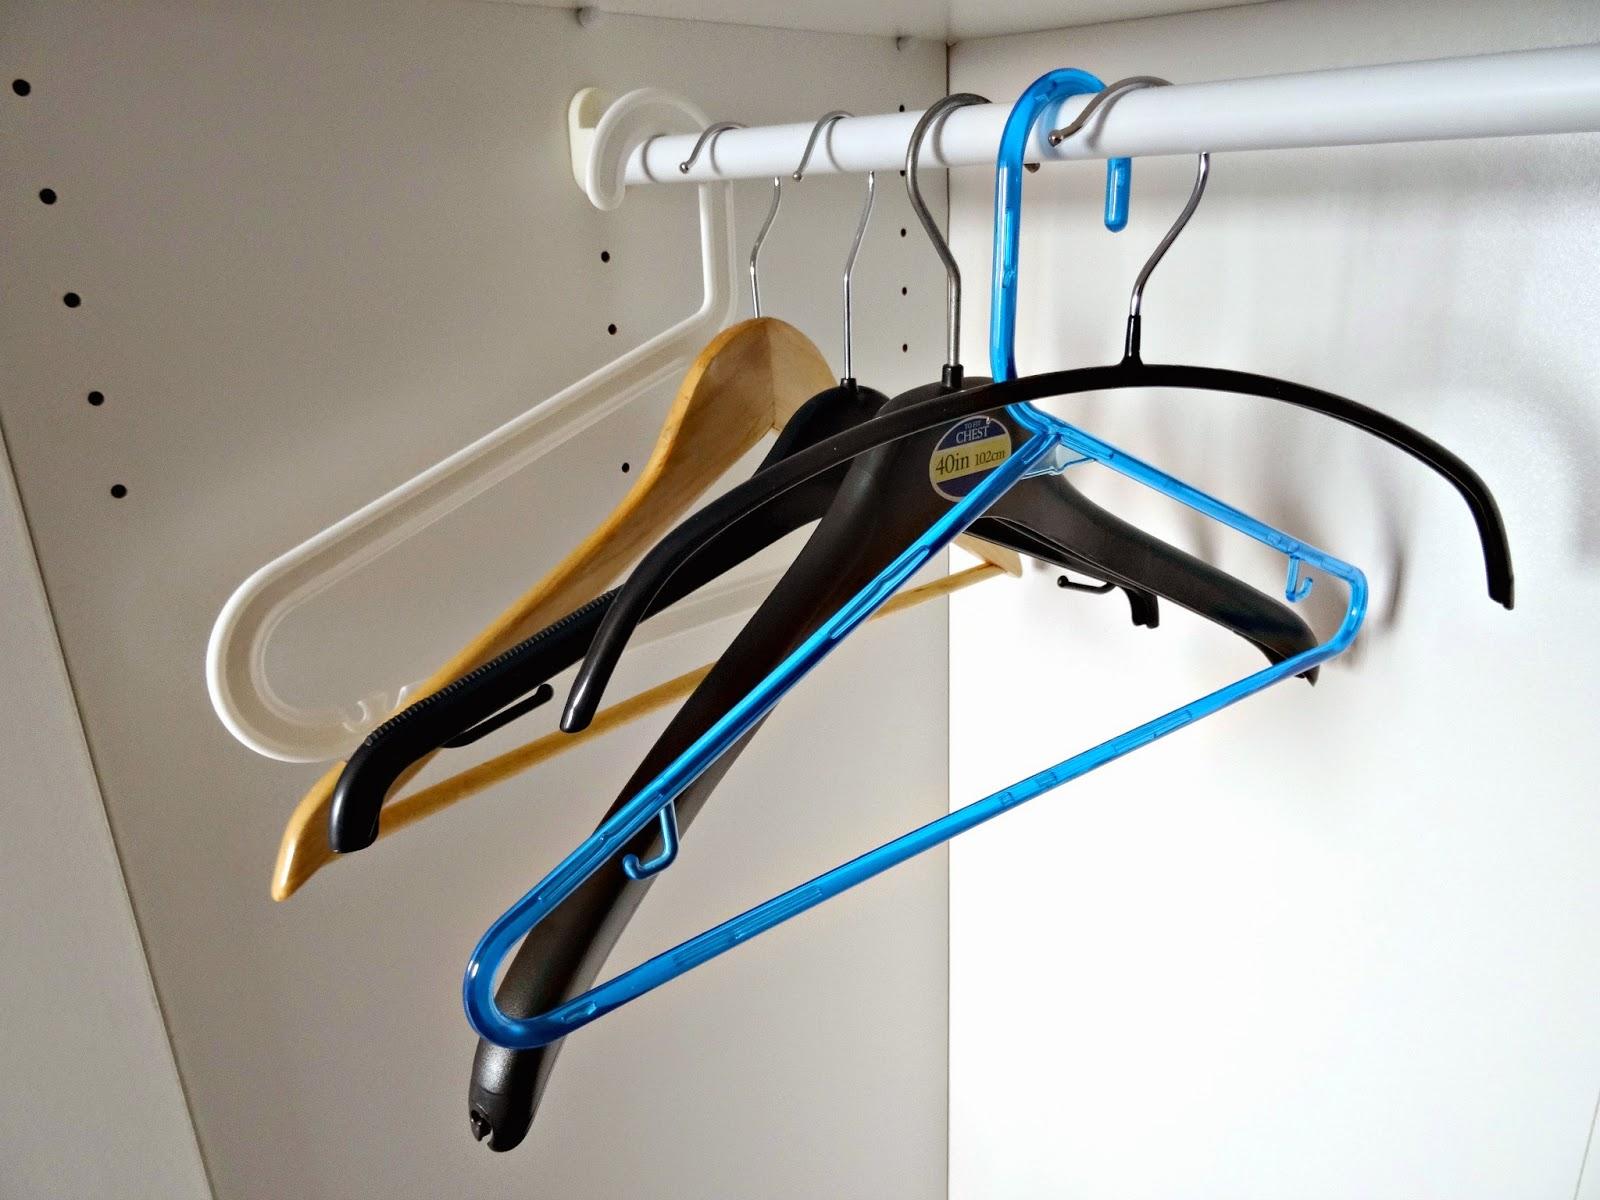 Hangers wardrobe